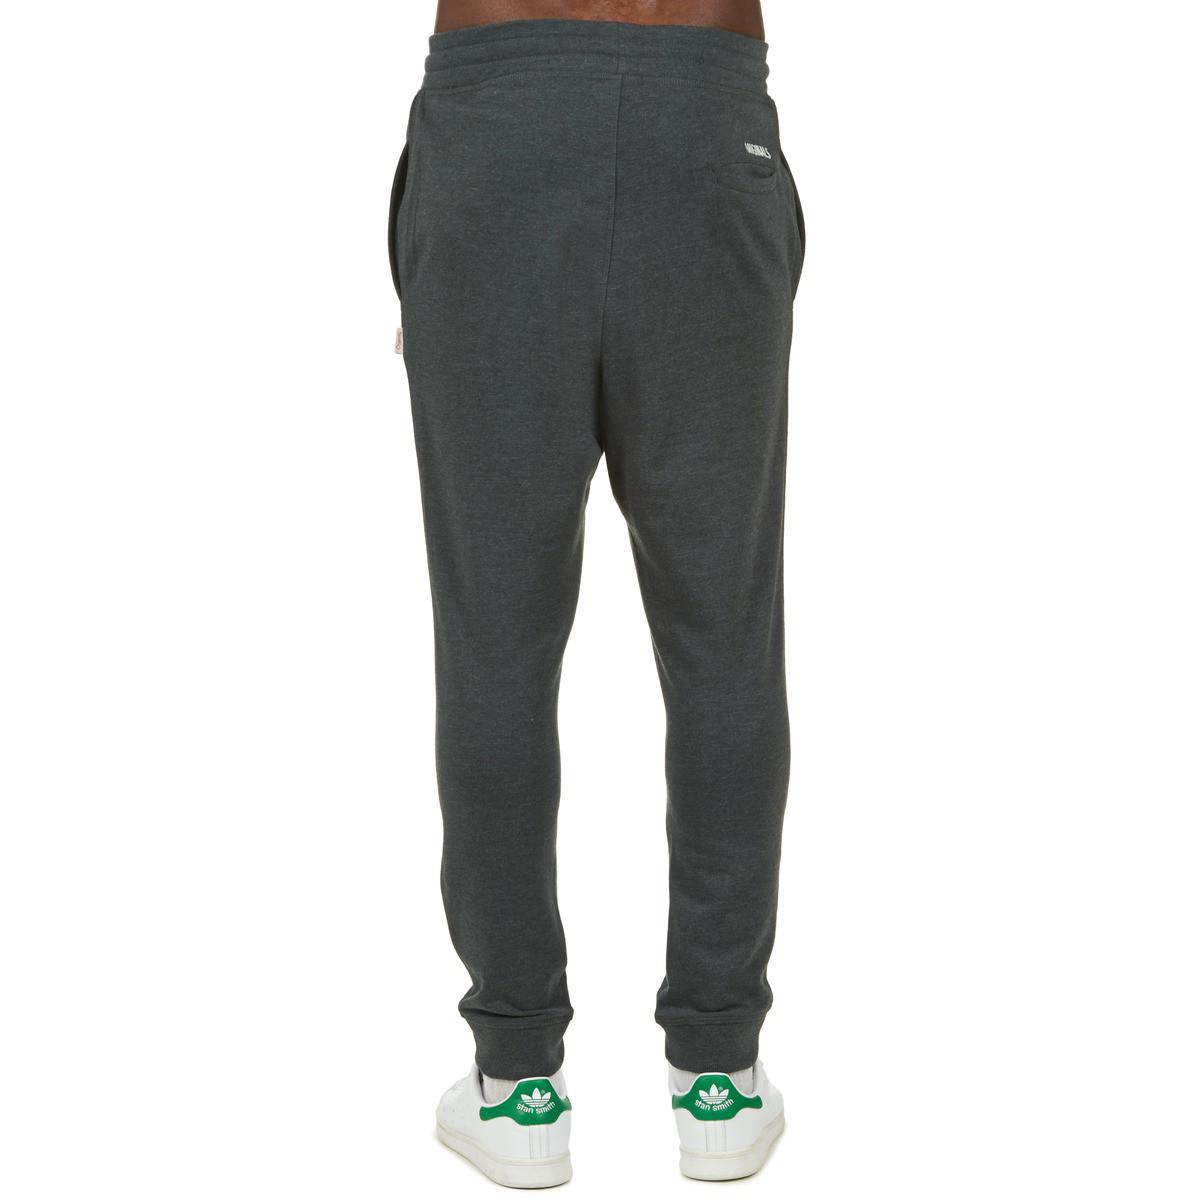 Jack Pant Pantalon Homme